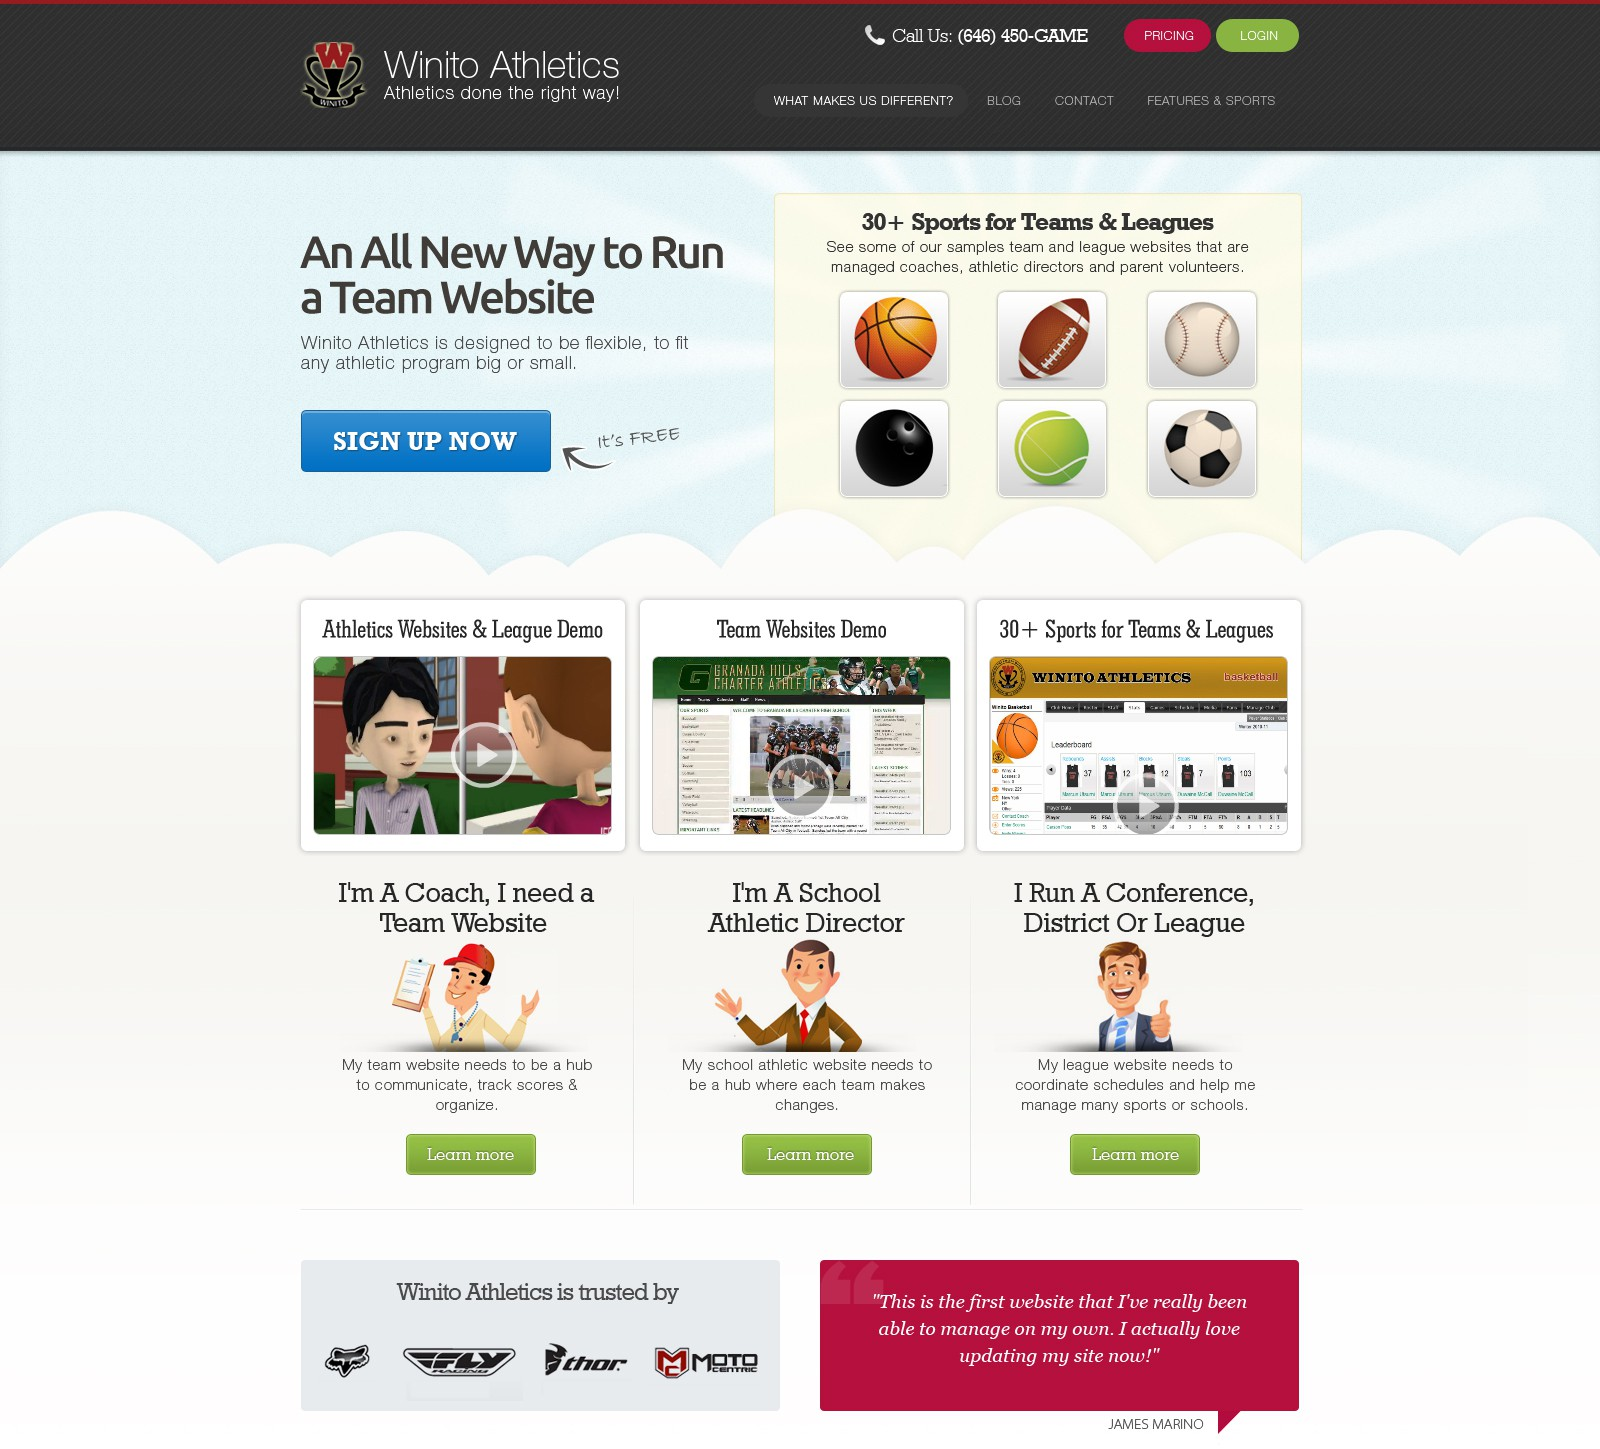 Fast Growing Startup Web 2.0 Company Winito Athletics needs new look